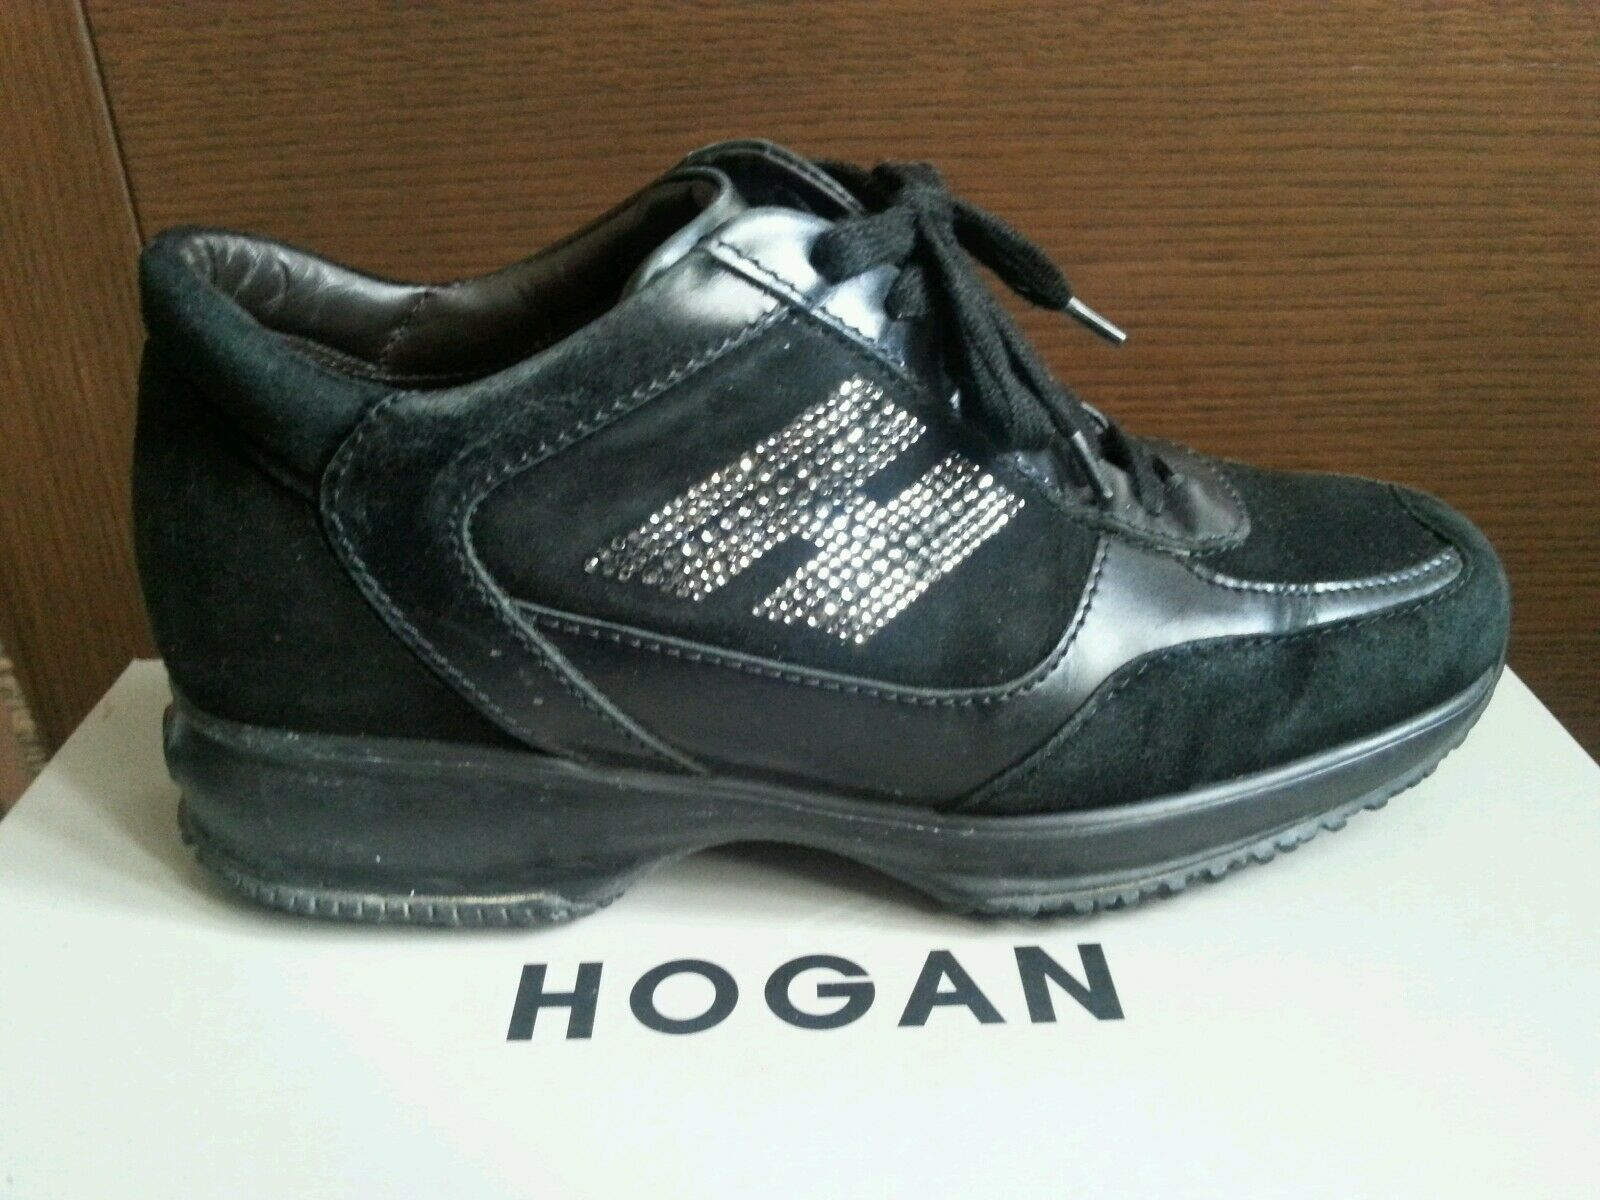 scarpe hogan donna interactive n.37 nero con strass